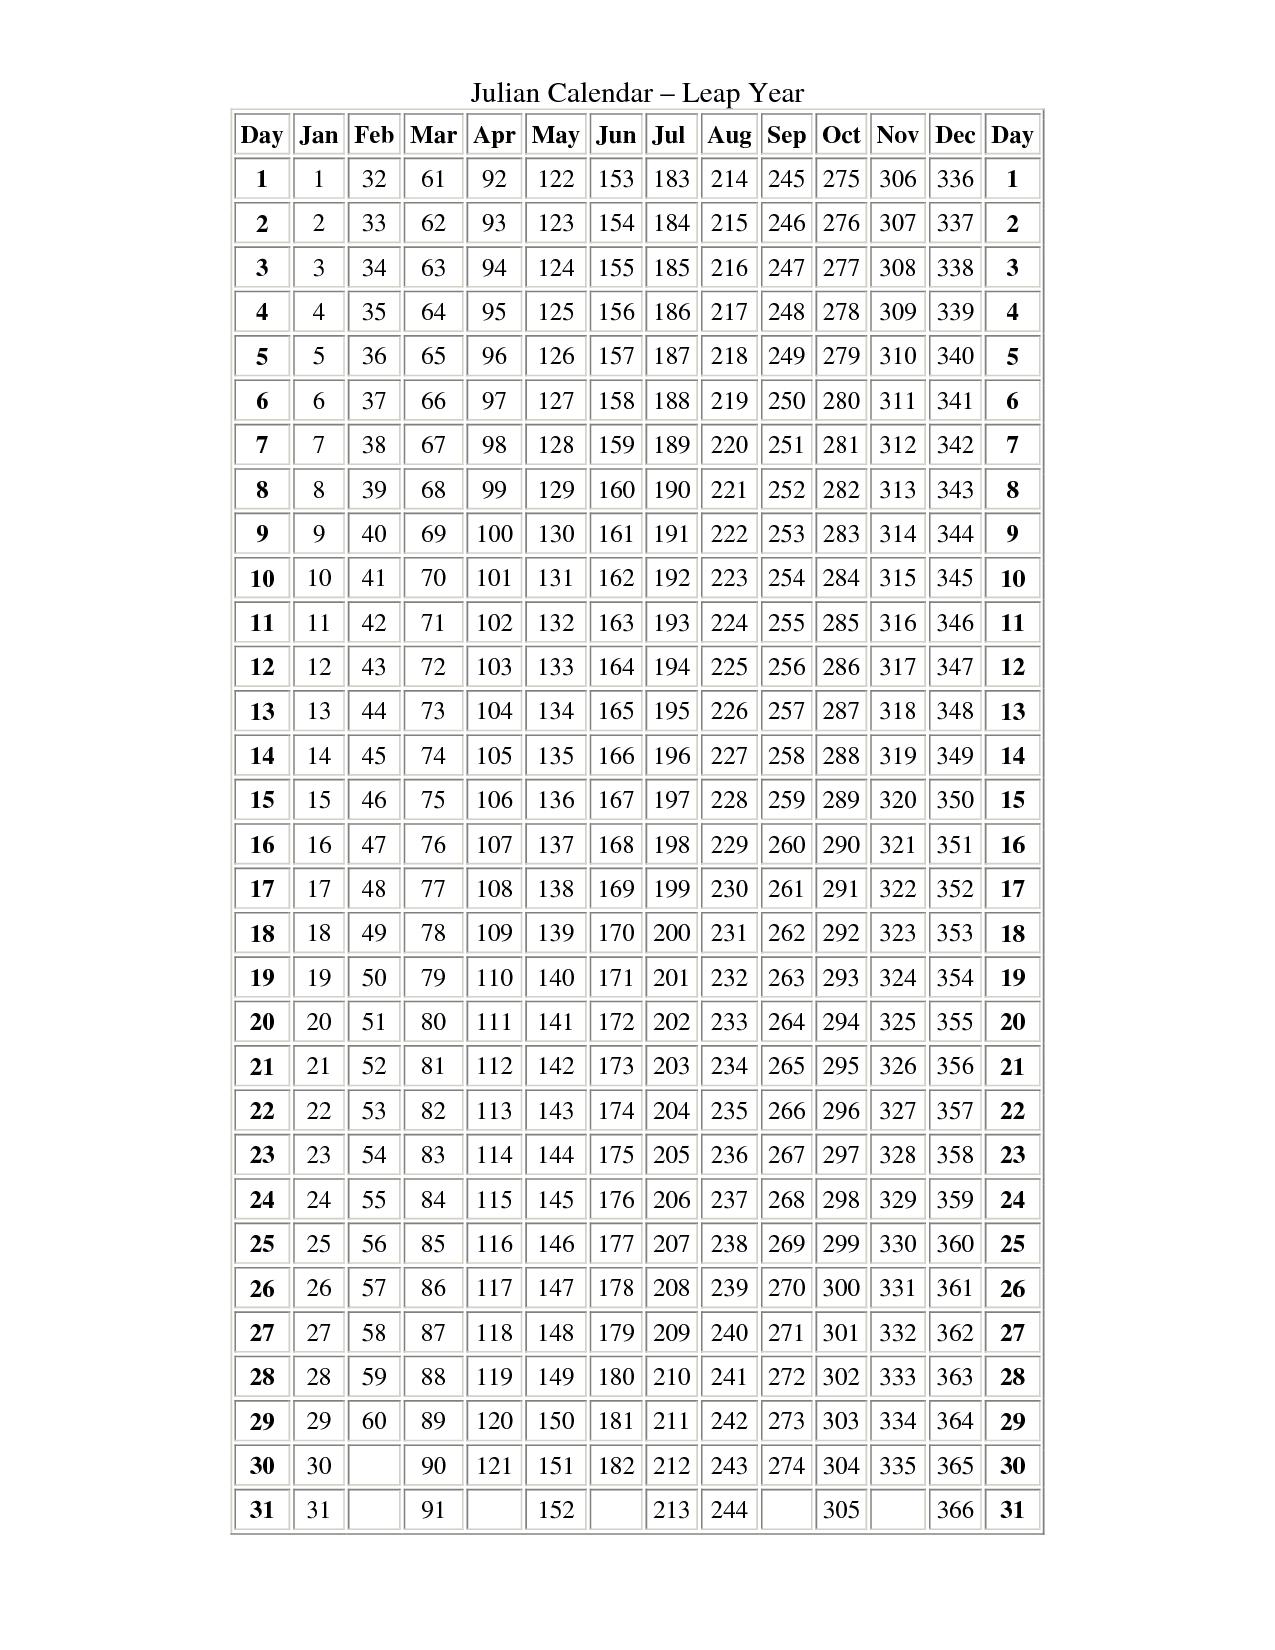 Julian Date Chart 2016 – Caska Julian Code Calculator Leap Year Printable